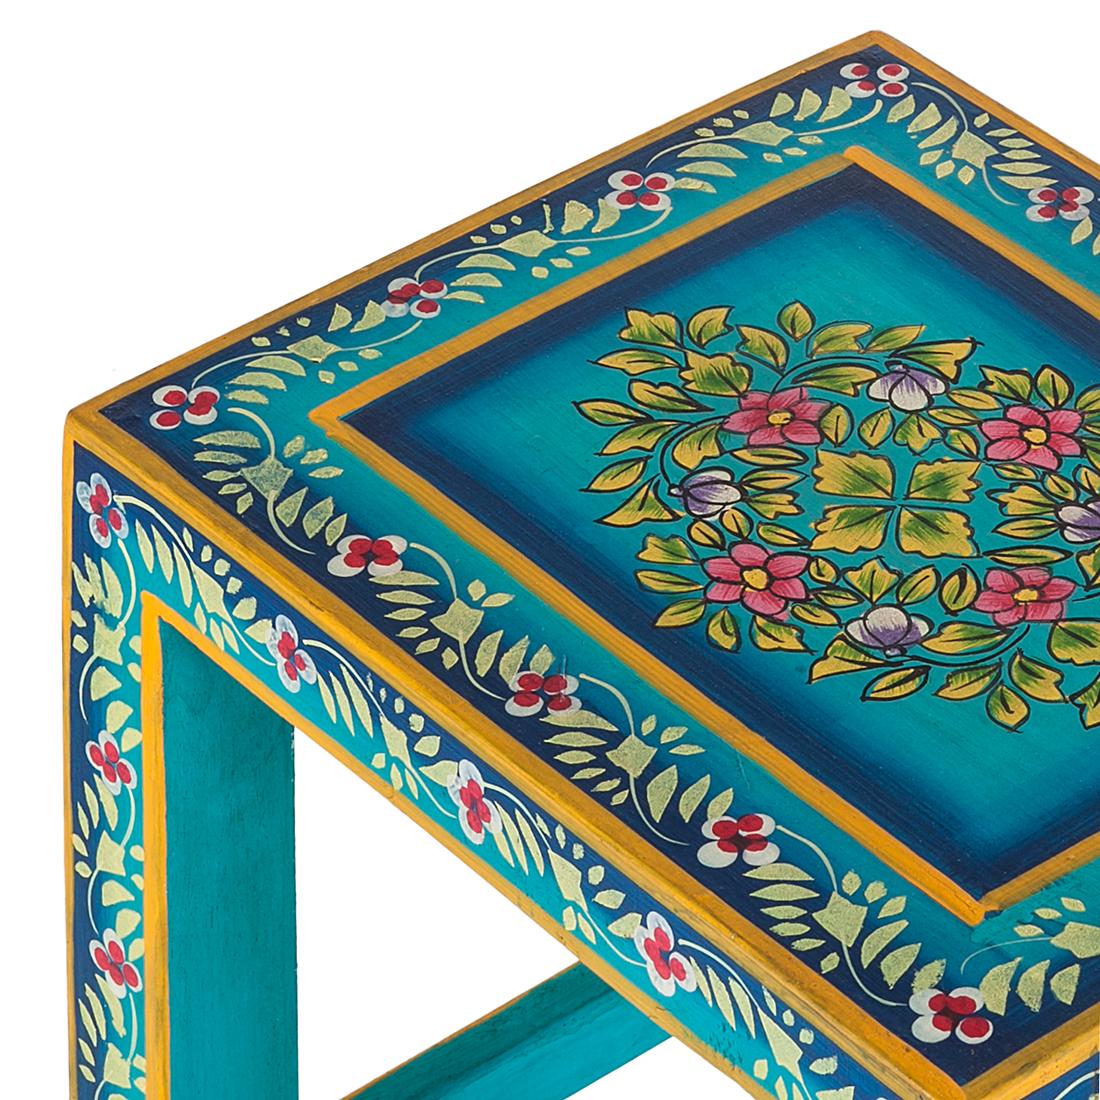 3er Set Kare Design Beistelltisch Mango Holz handbemalt